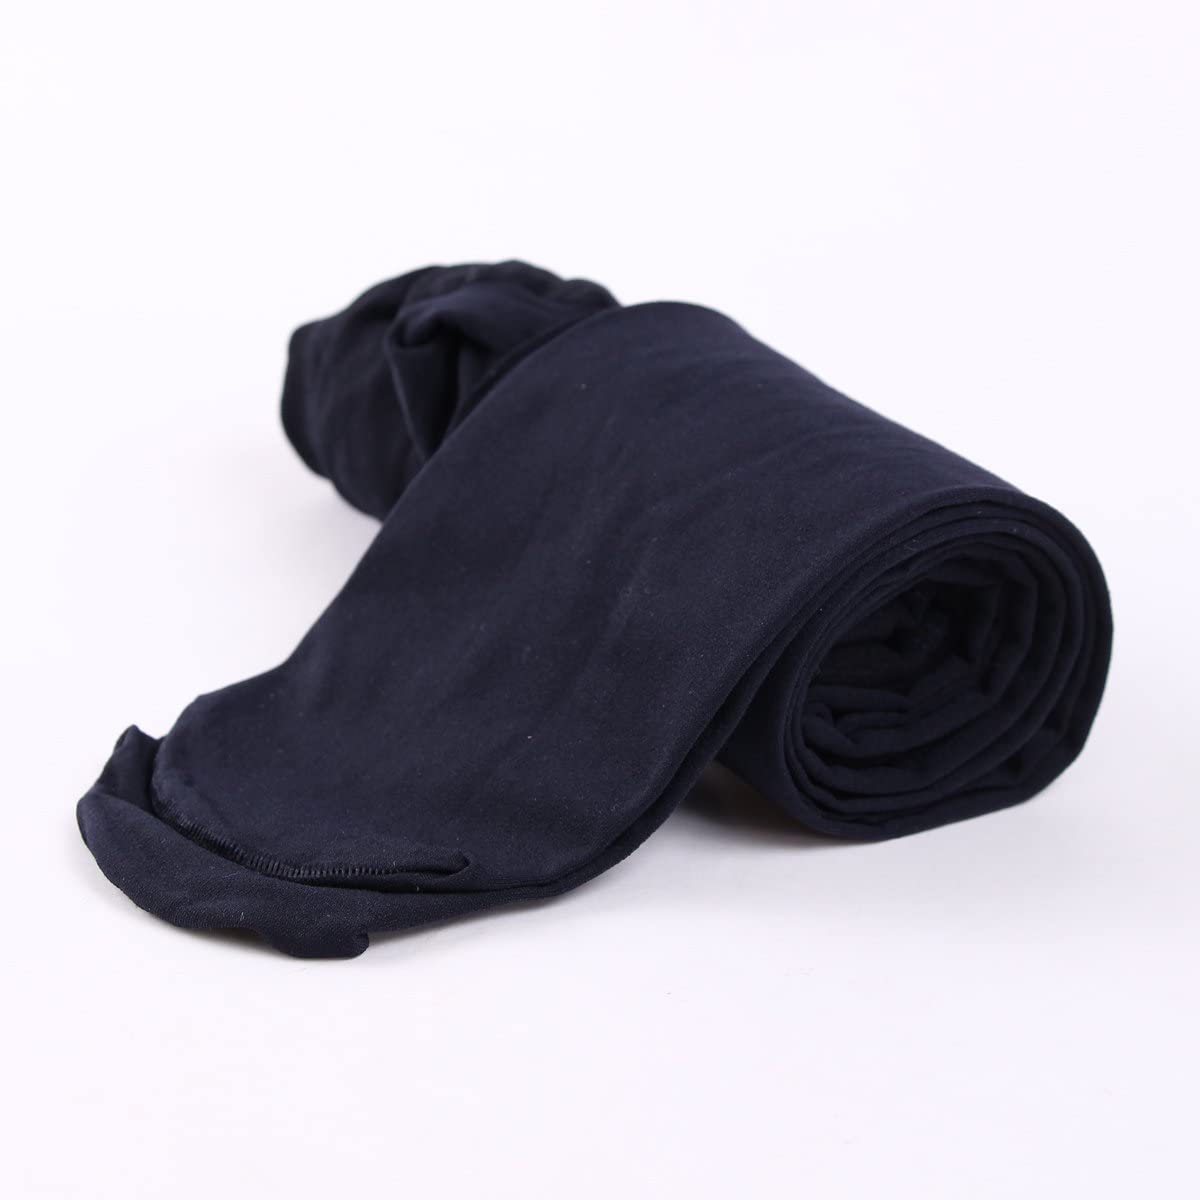 FEOYA Women Stretch Maternity Leggings Support Compression Stockings 320D